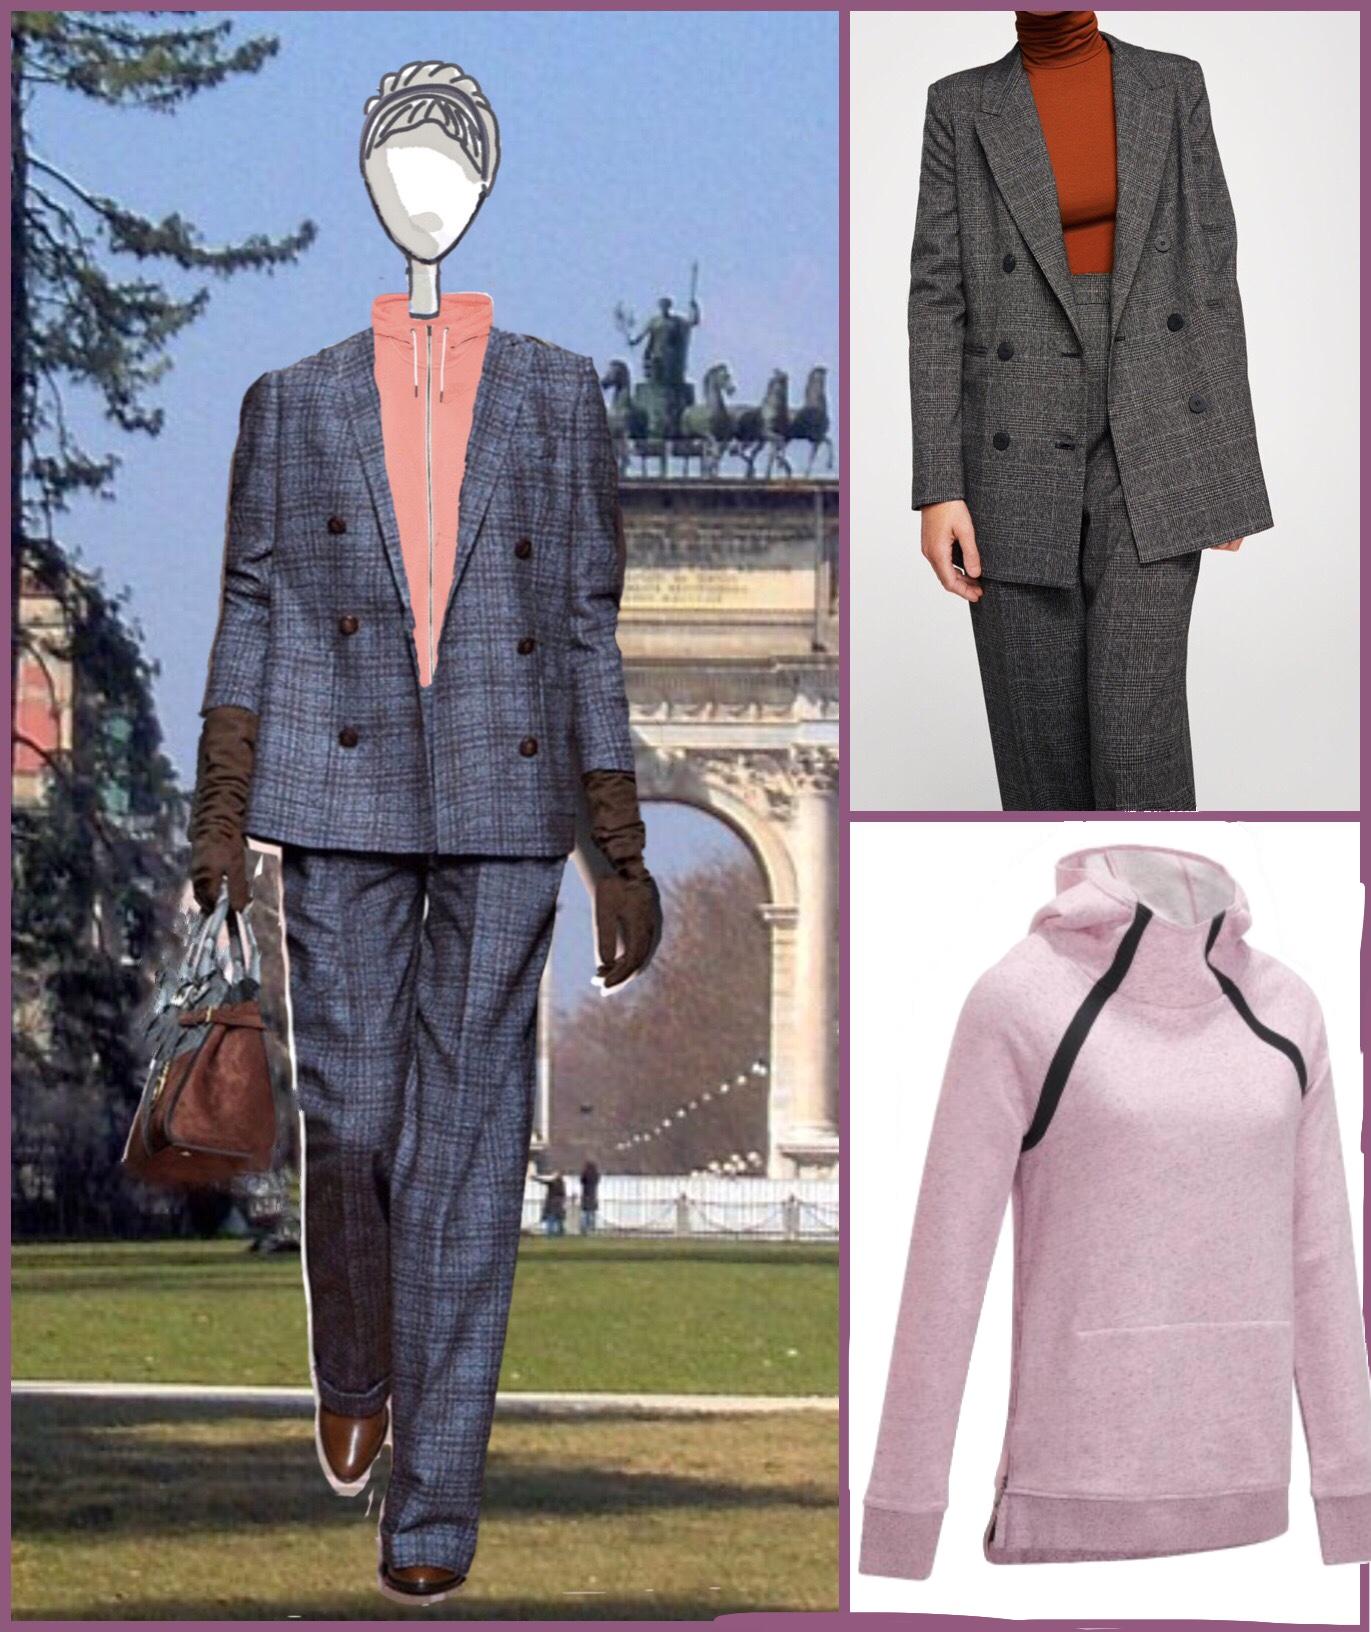 tailleur maschile con felpa